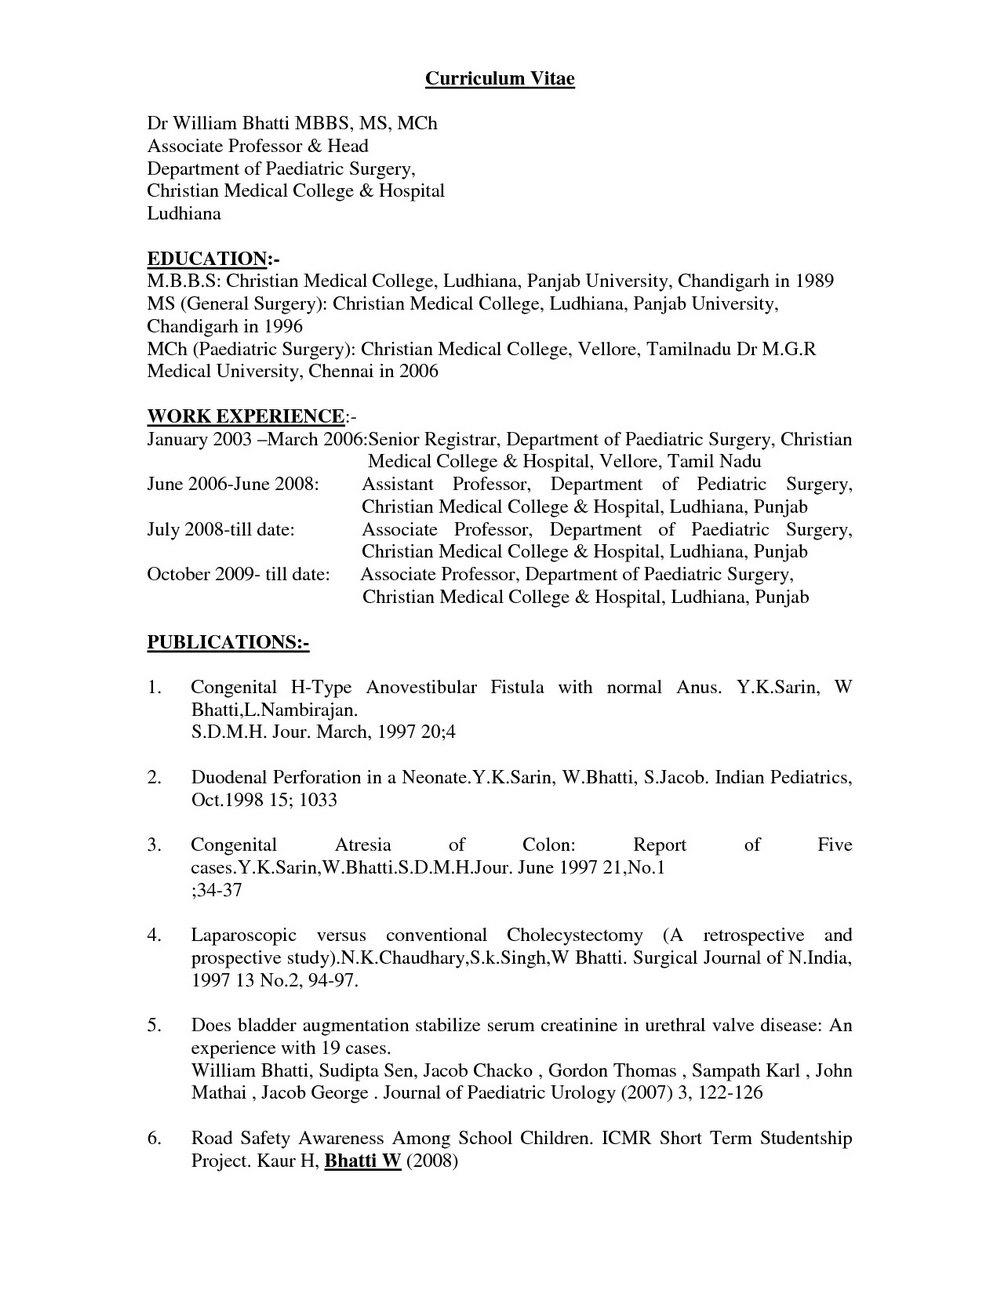 Resume Format For Lecturer Free Download